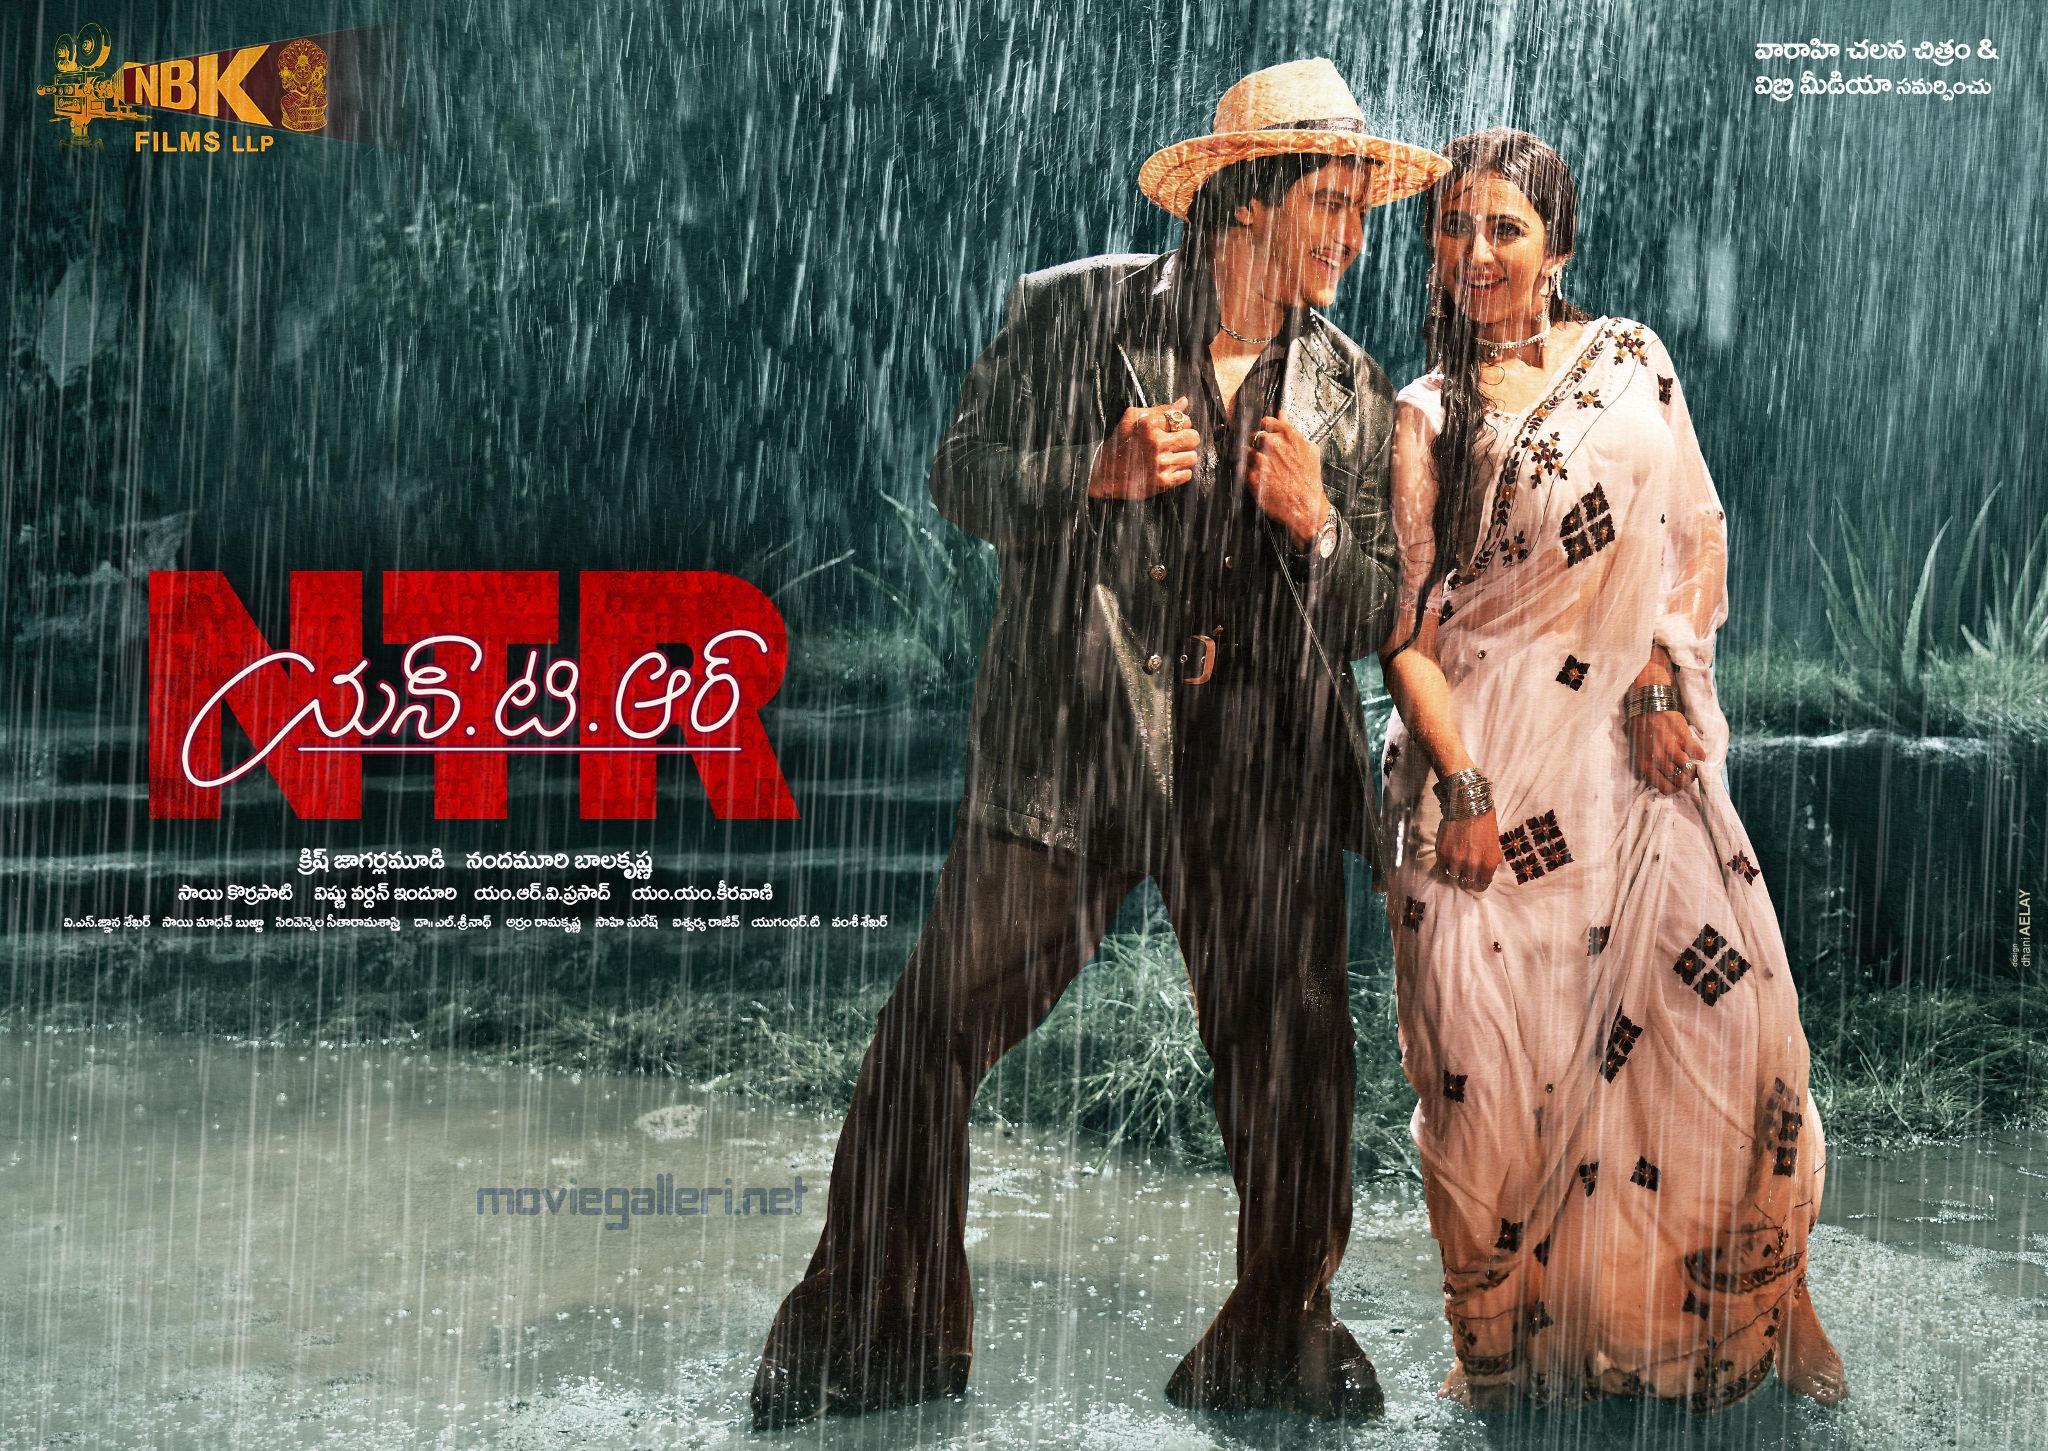 NBK as NTR and Rakul Preet Singh as Sridevi from NTR Biopic Movie Poster HD